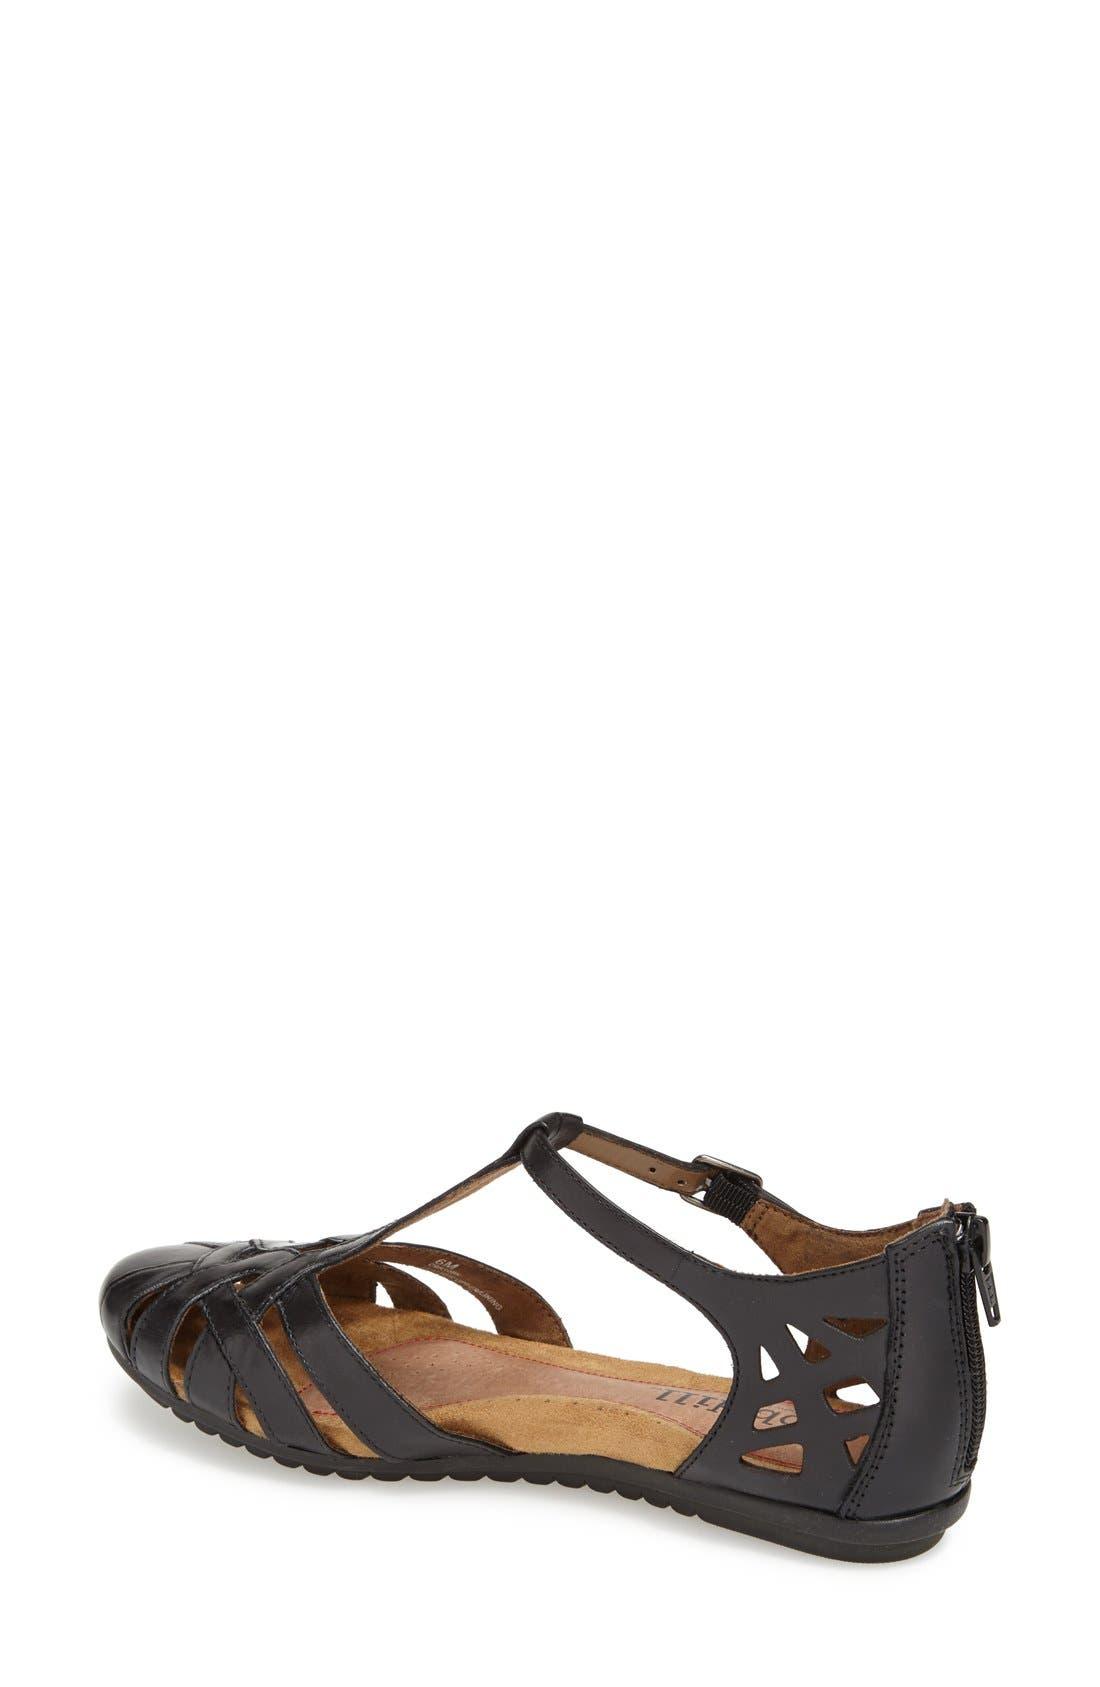 ROCKPORT COBB HILL, 'Ireland' Leather Sandal, Alternate thumbnail 3, color, BLACK